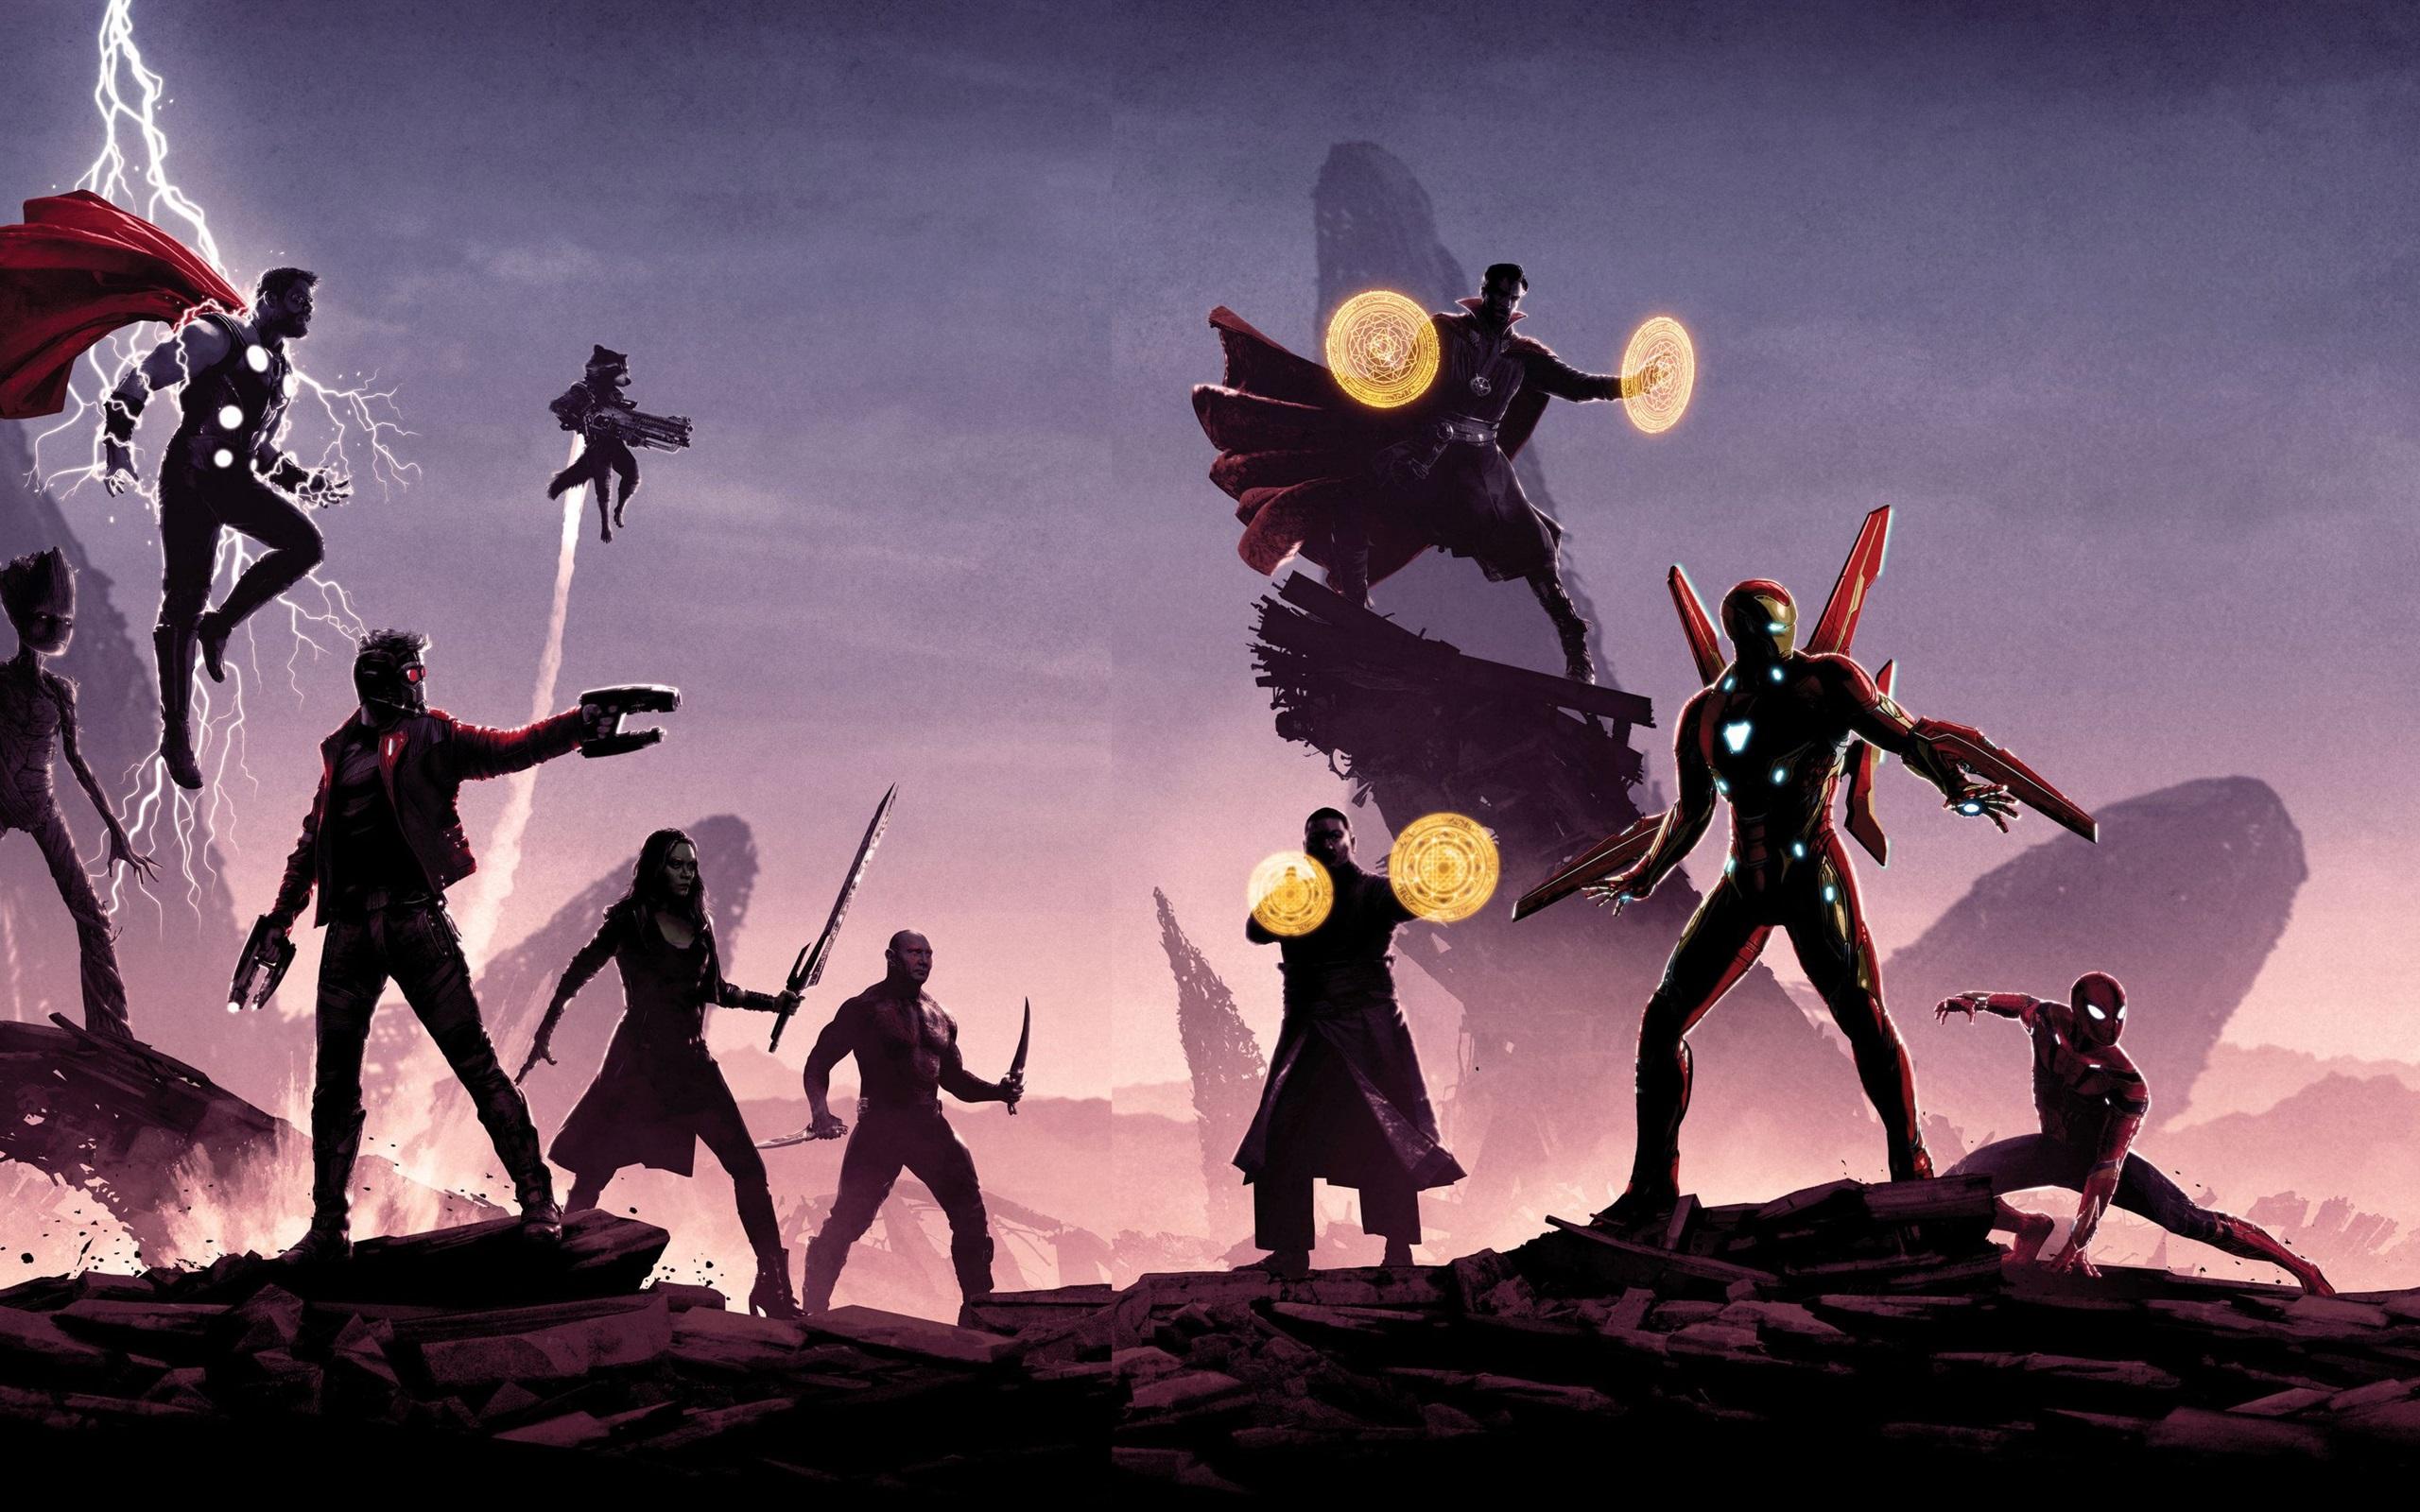 Avengers Infinity War 2018 Thanos 4k Uhd 3 2 3840x2560: 壁纸 2018年电影,复仇者联盟:无限战争 2560x1600 HD 高清壁纸, 图片, 照片